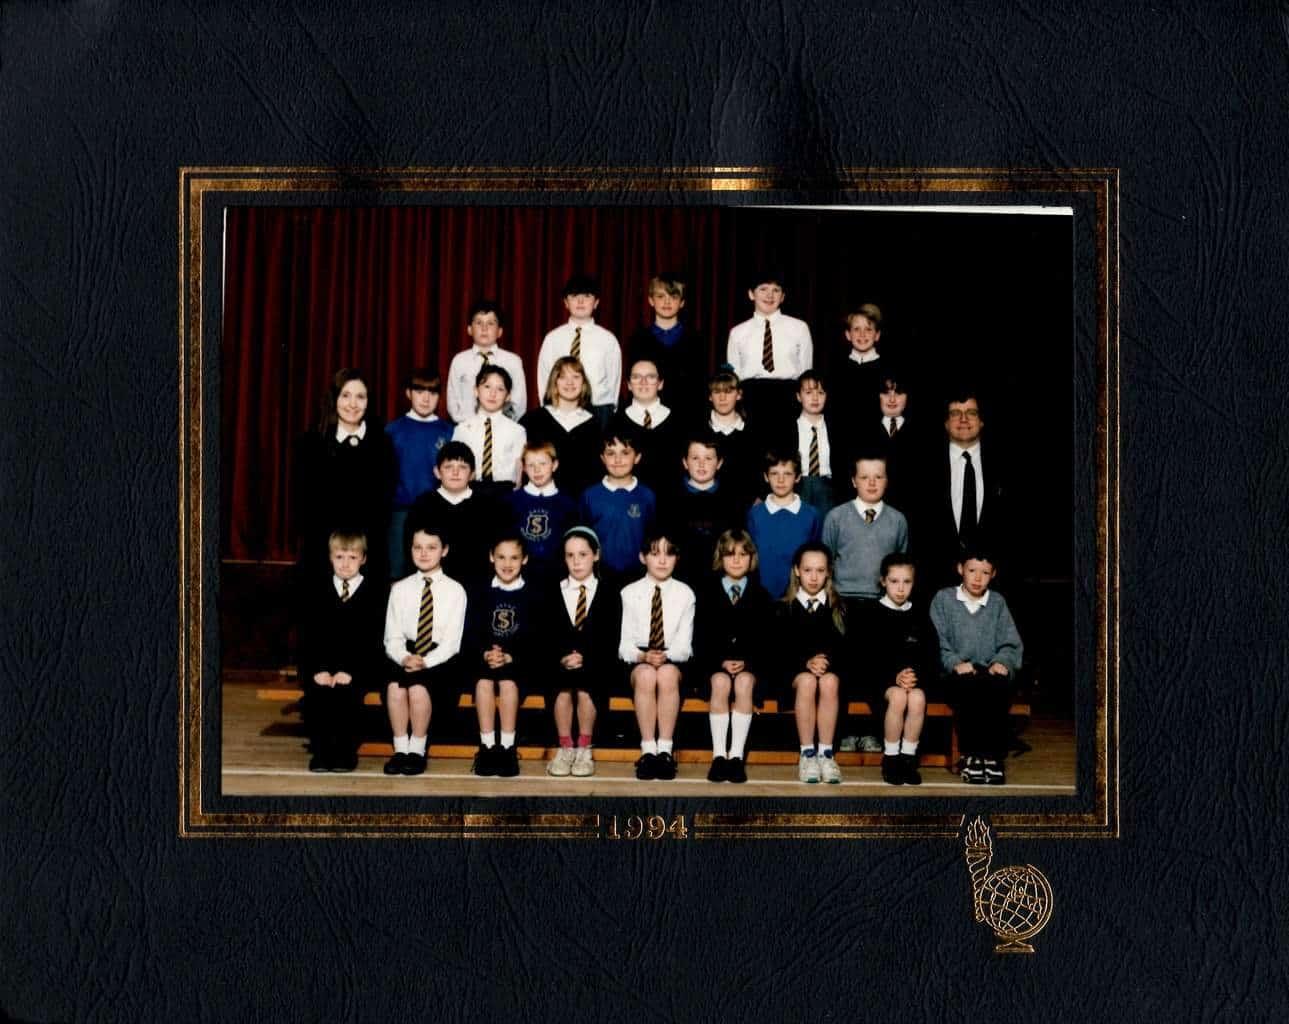 Sarah School Photo - 1994